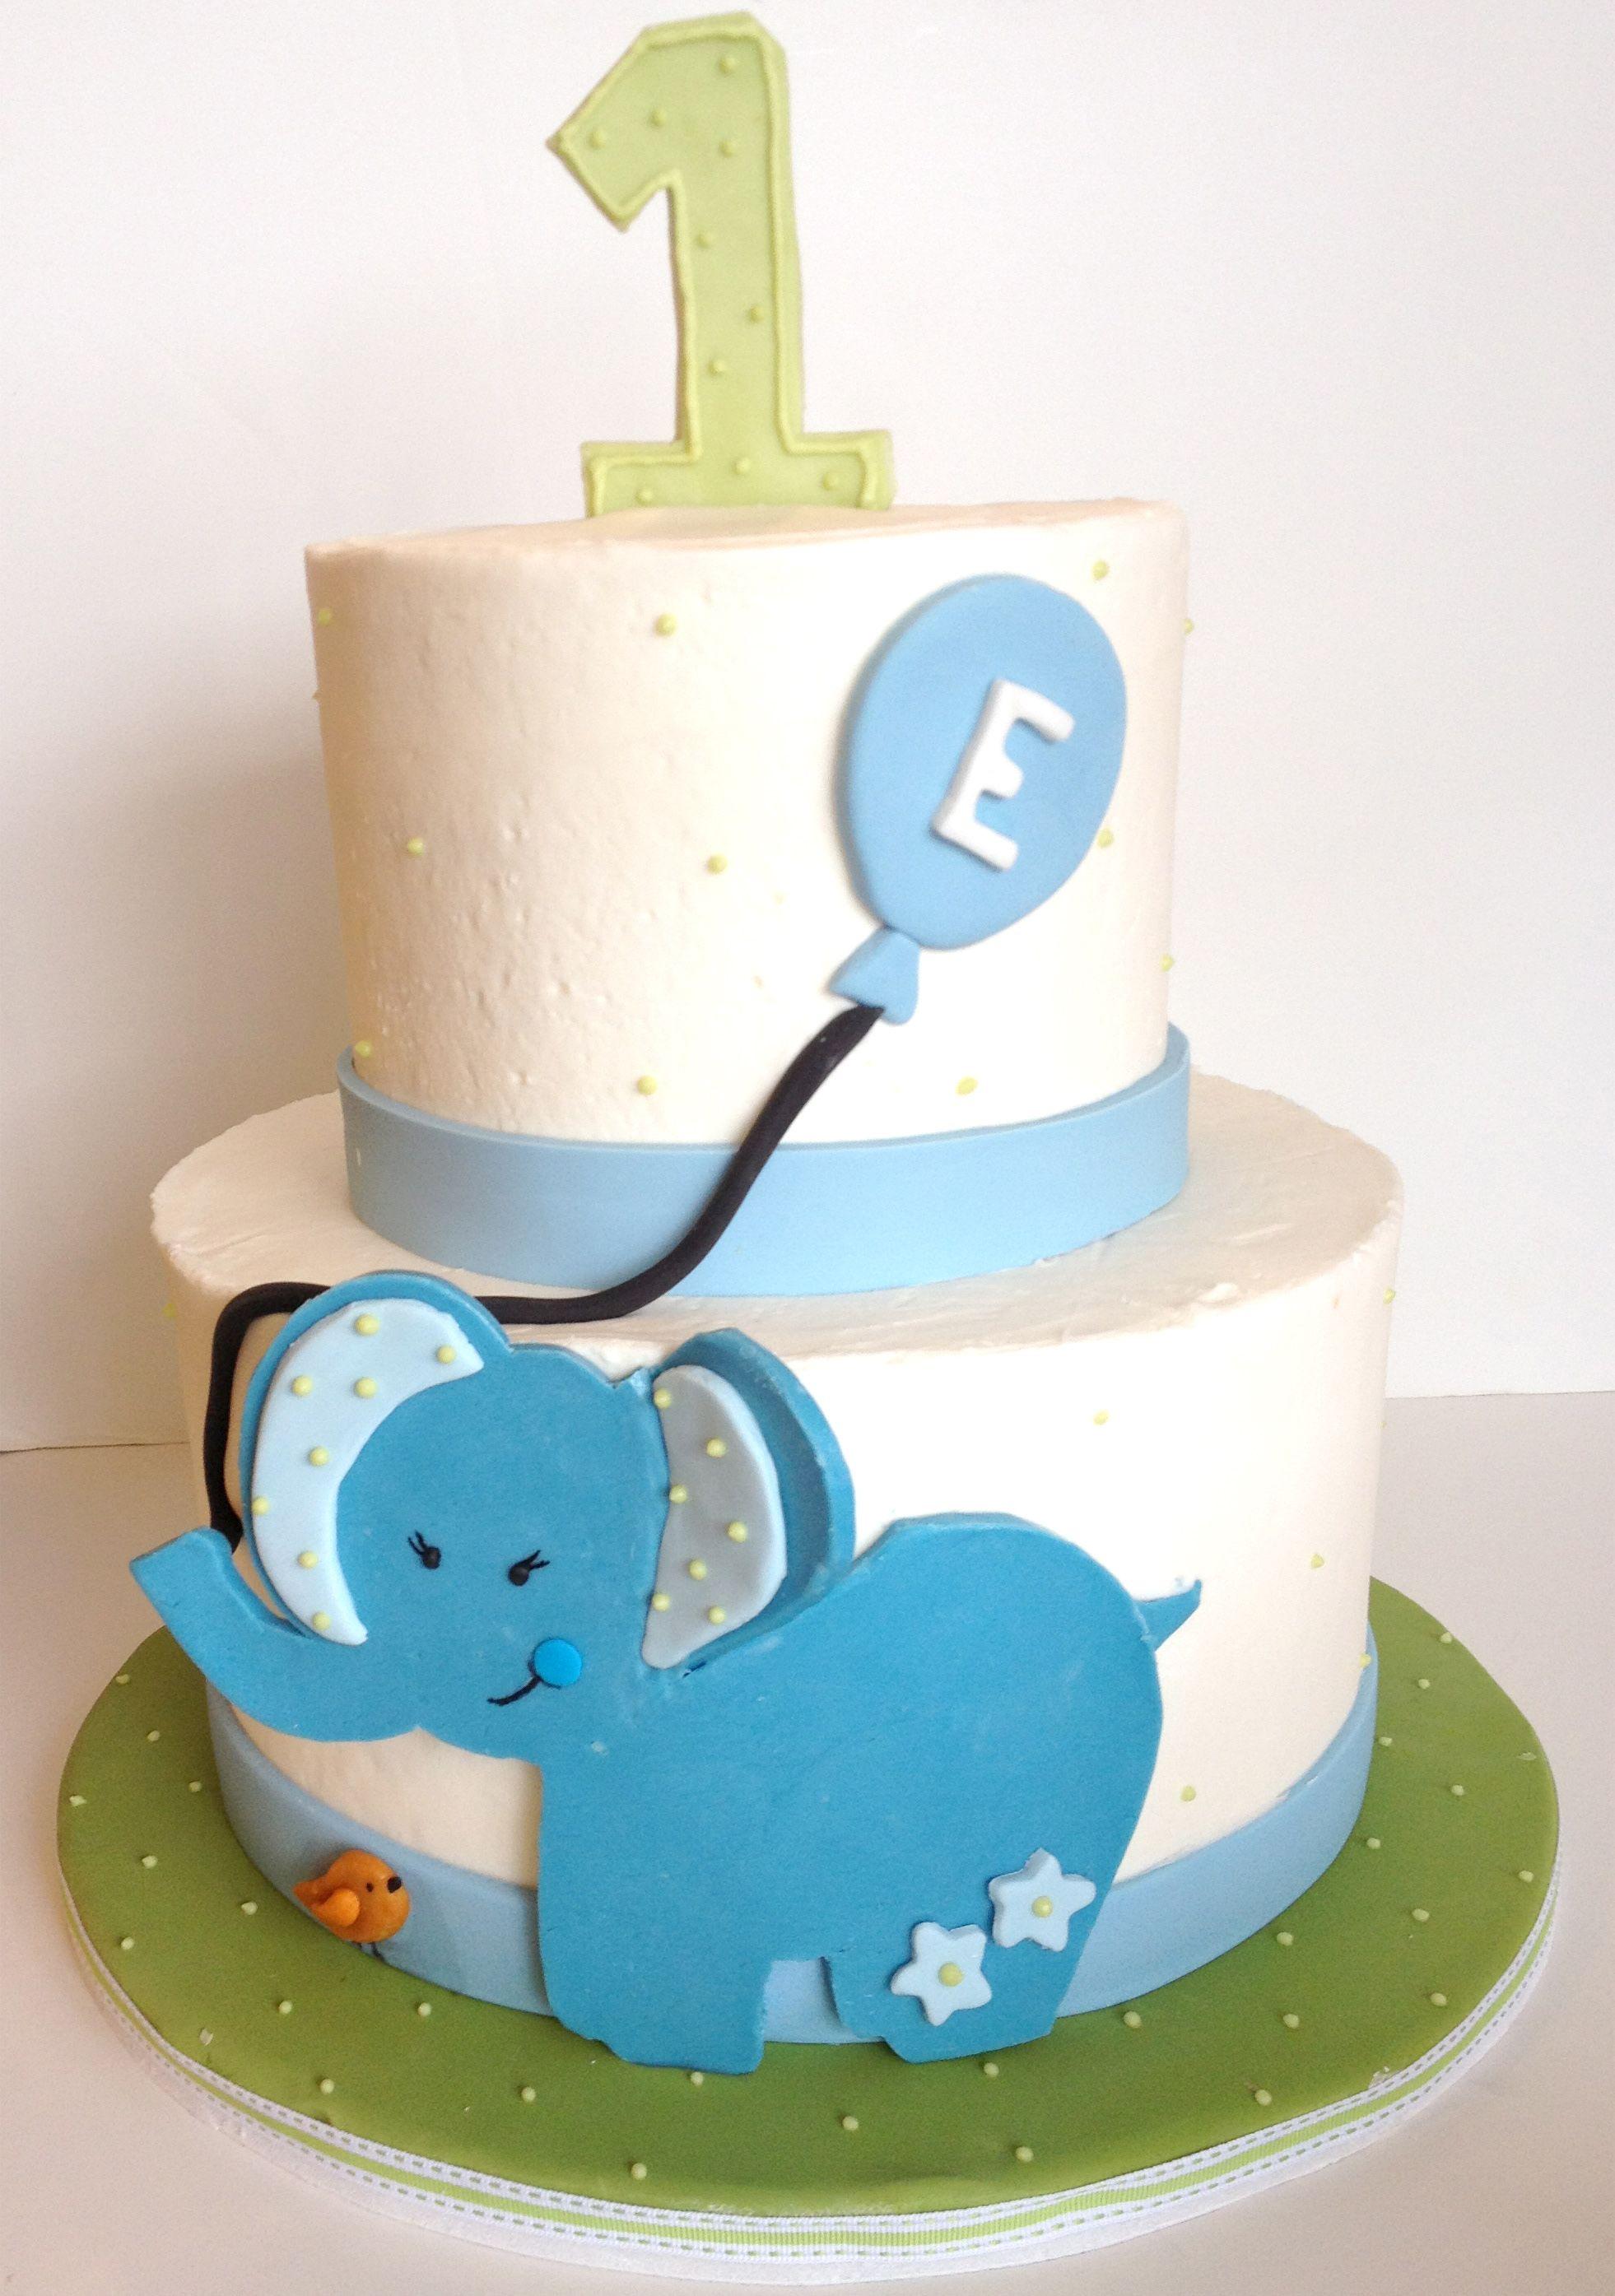 Blue elephant cake  ^v^v^  Cake Decorating  ^v^v ...